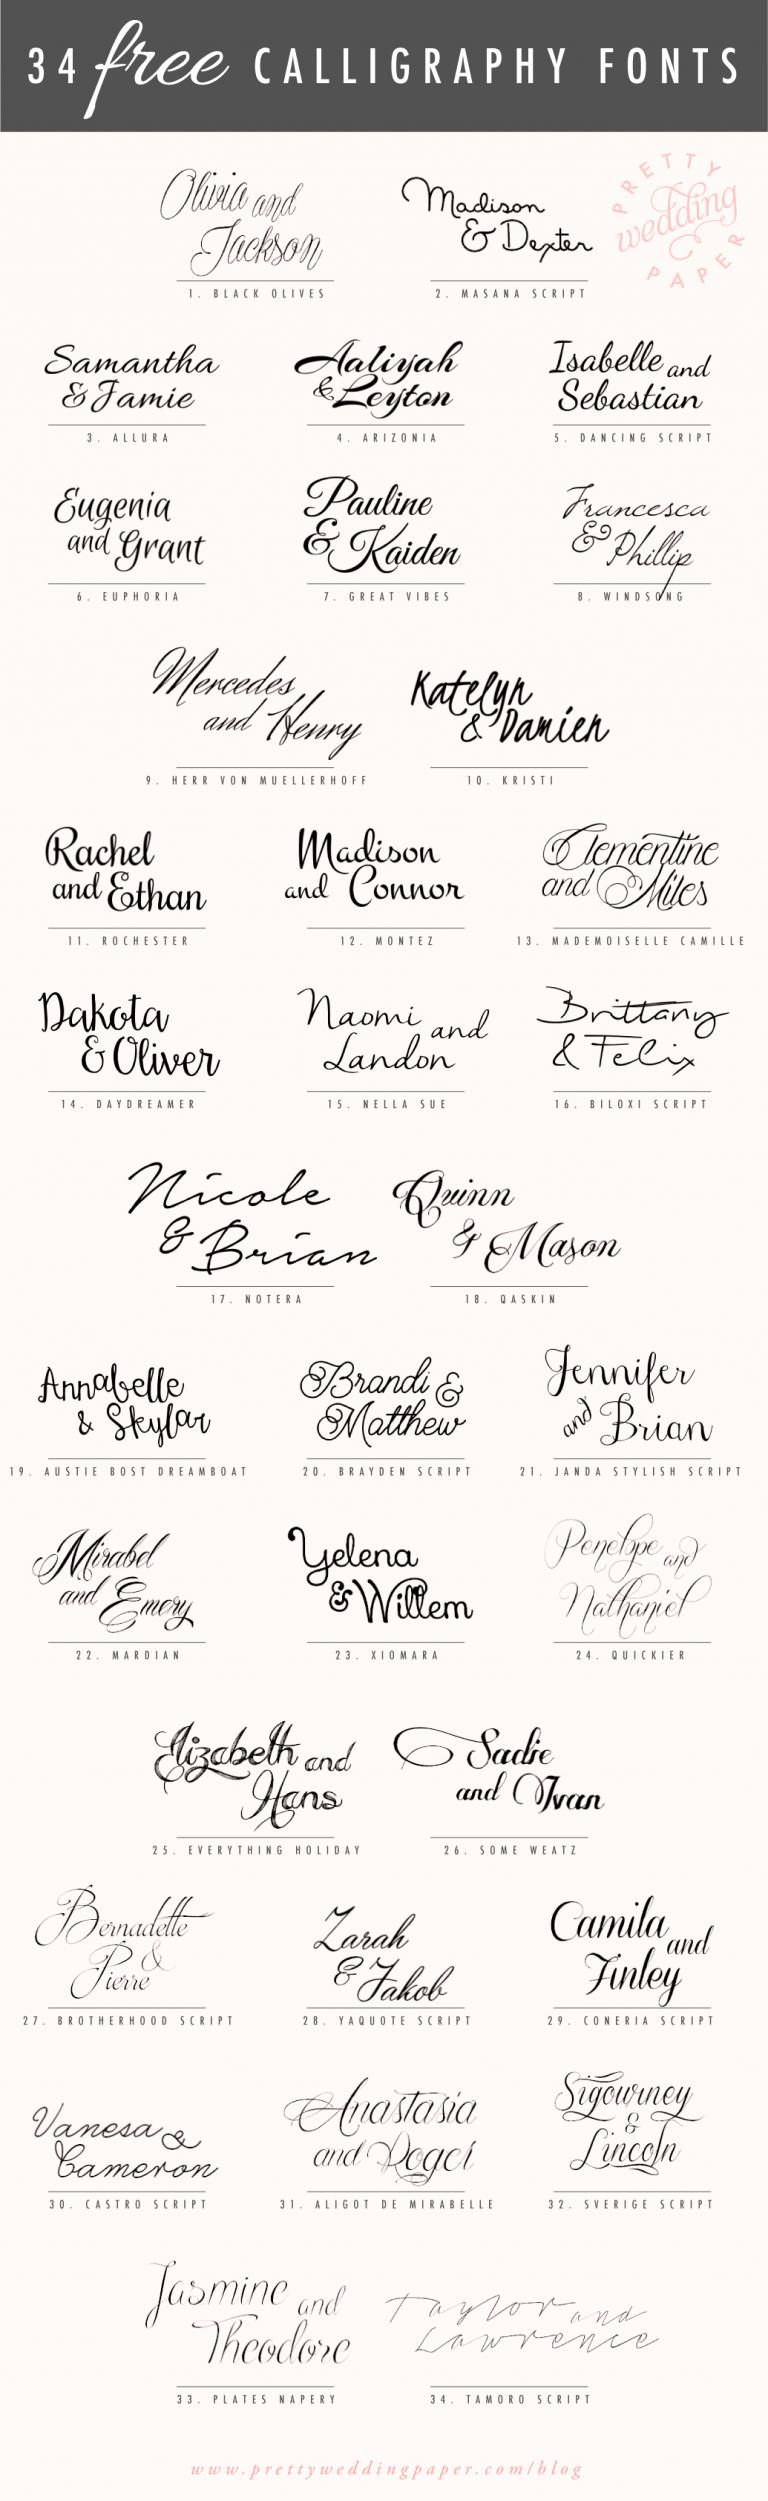 Fonts for Wedding Invitation Envelopes Unique [ฟรี] ดาวน์โหลด 34 ฟอนต์ตัวเขียน ฟอนต์ตัวหนังสือสวยๆ